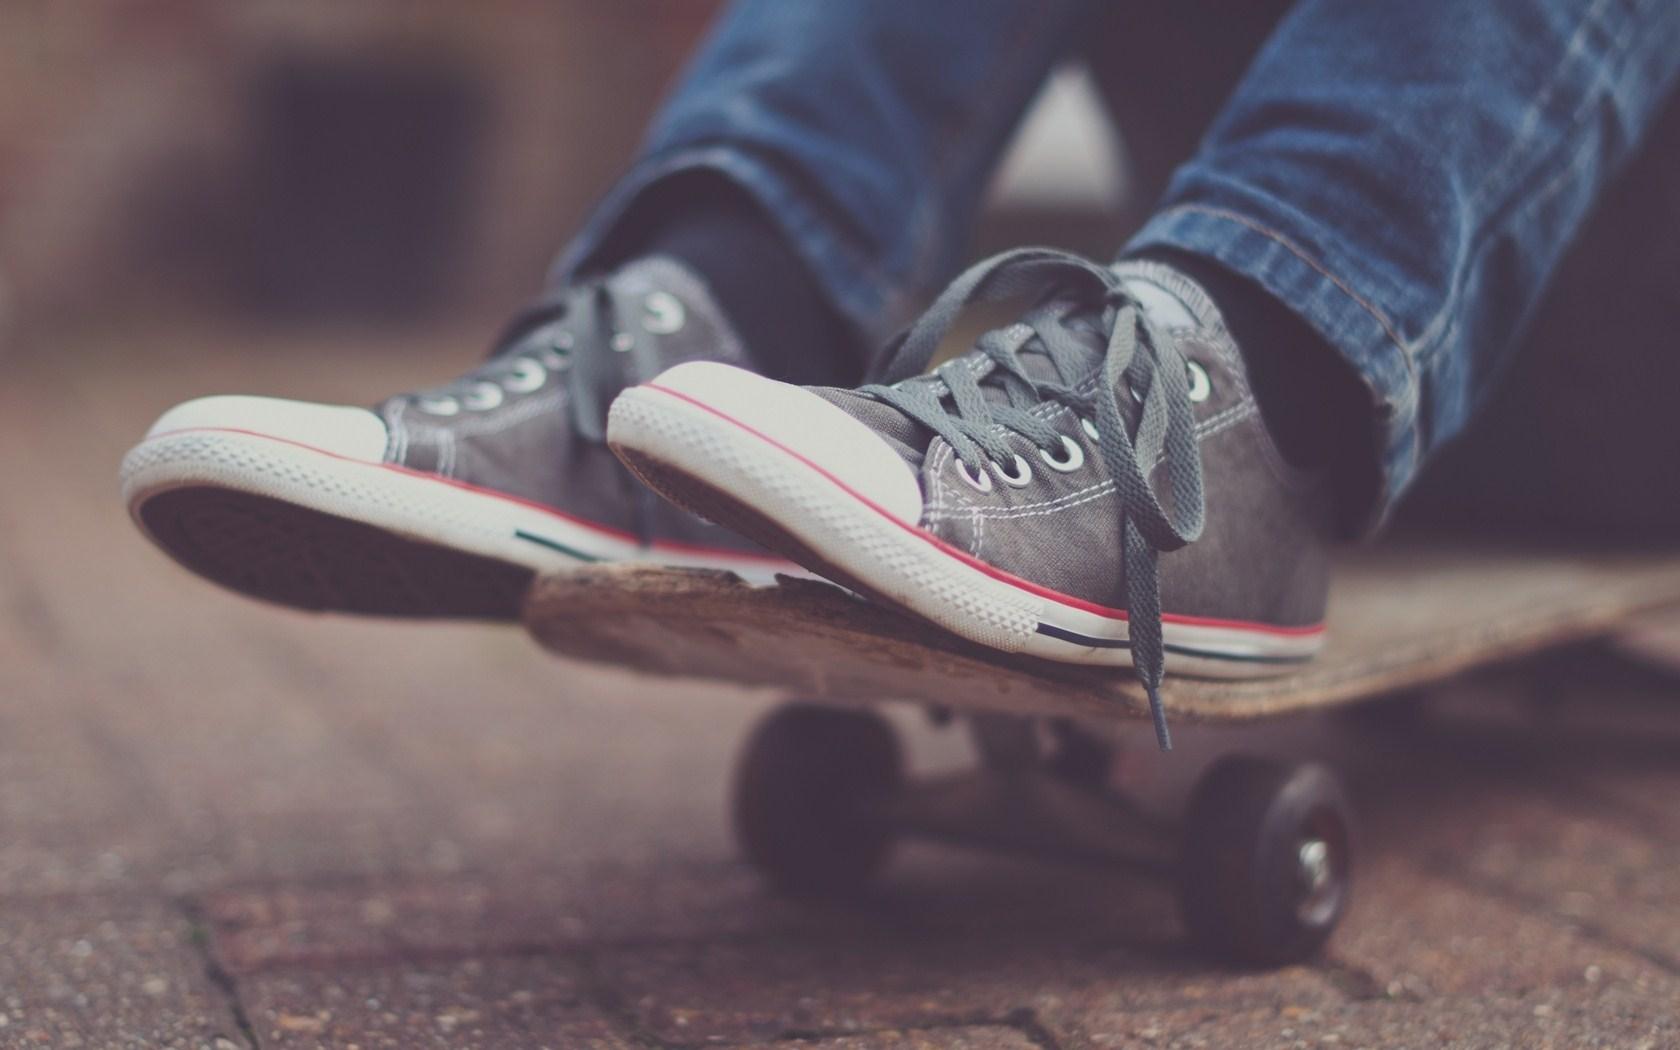 3 Best Skate Parks in the UK